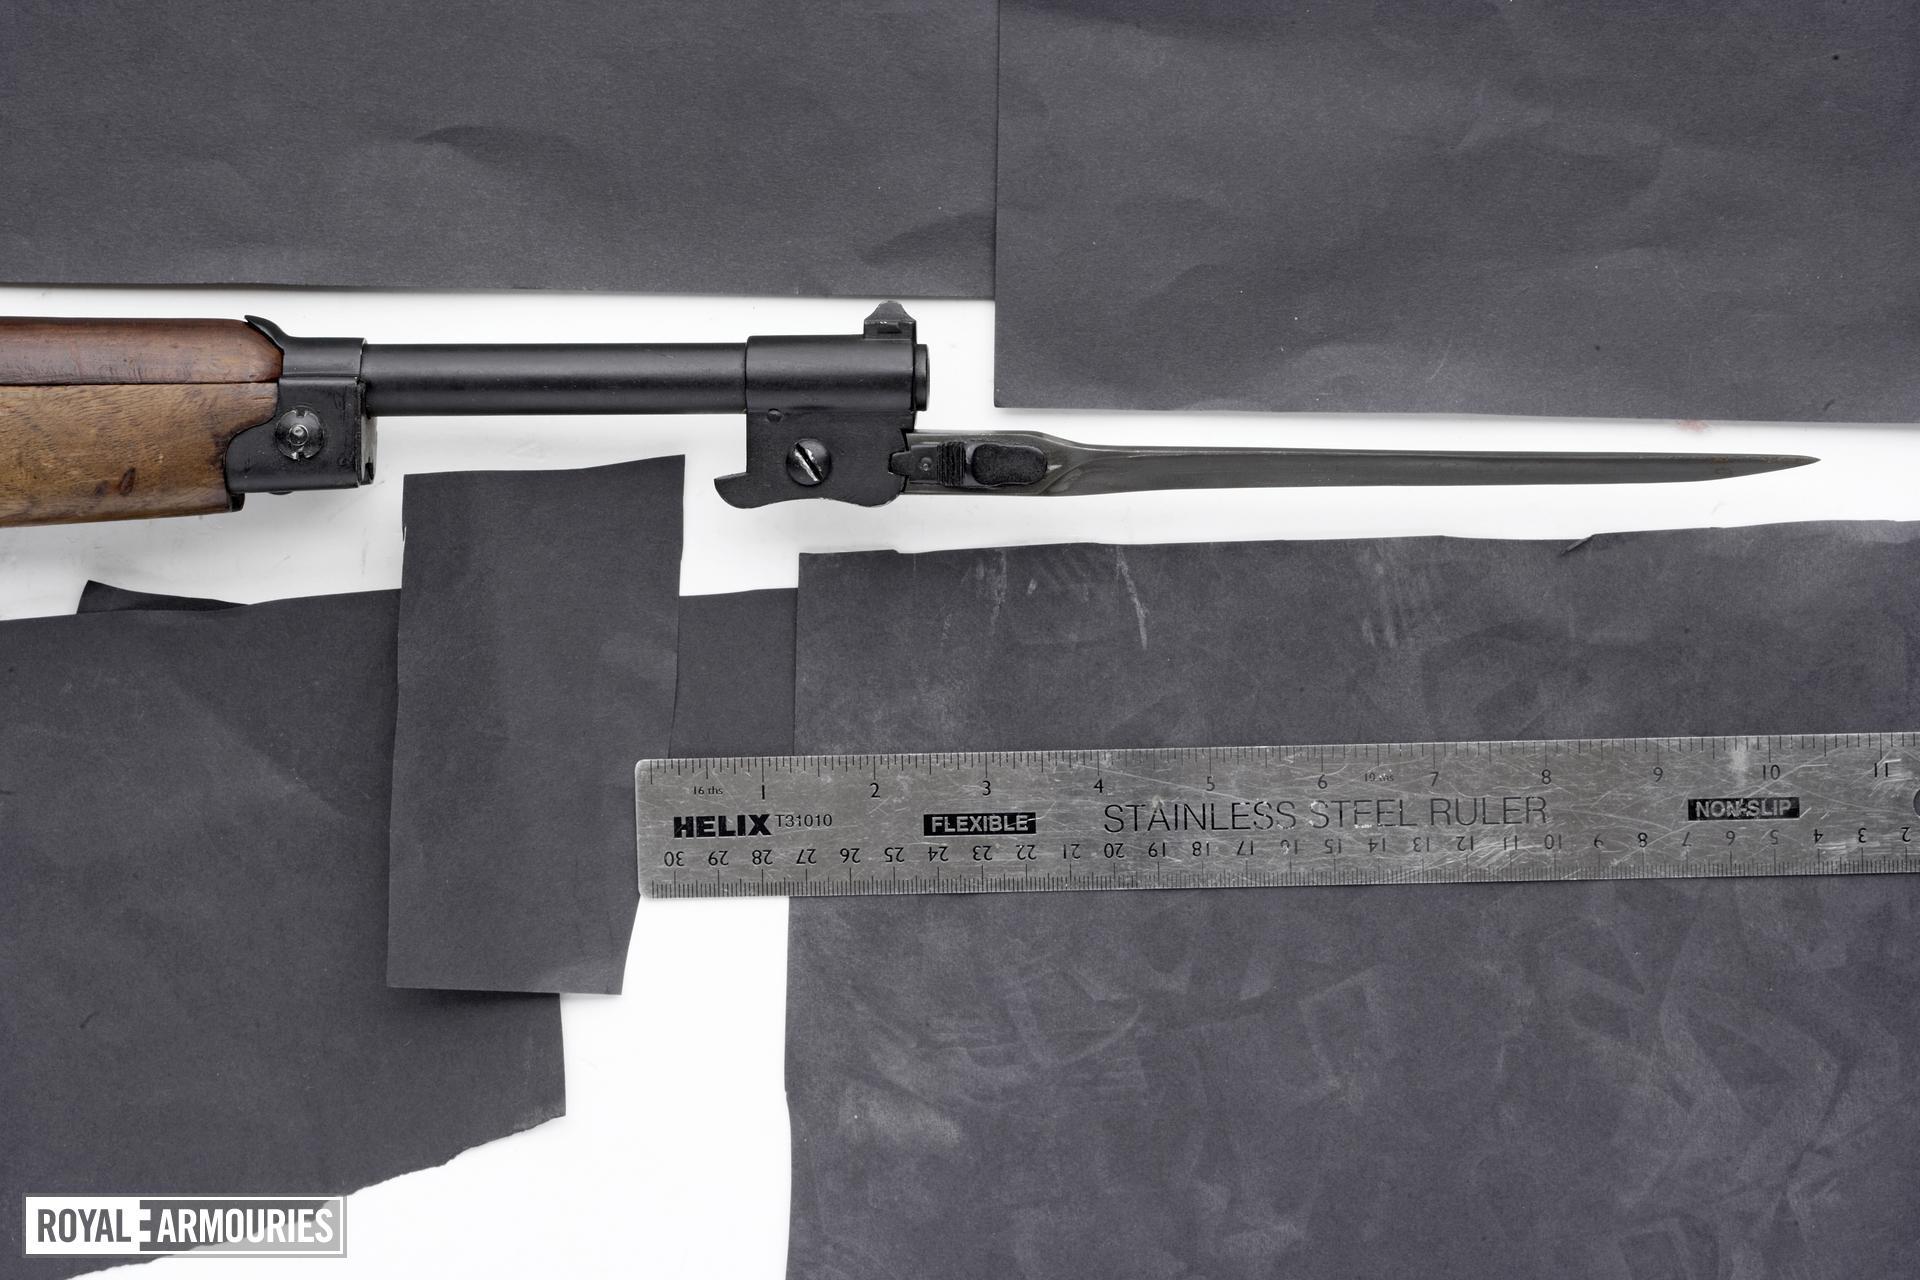 Centrefire automatic submachine gun - Beretta Mod 1918/30